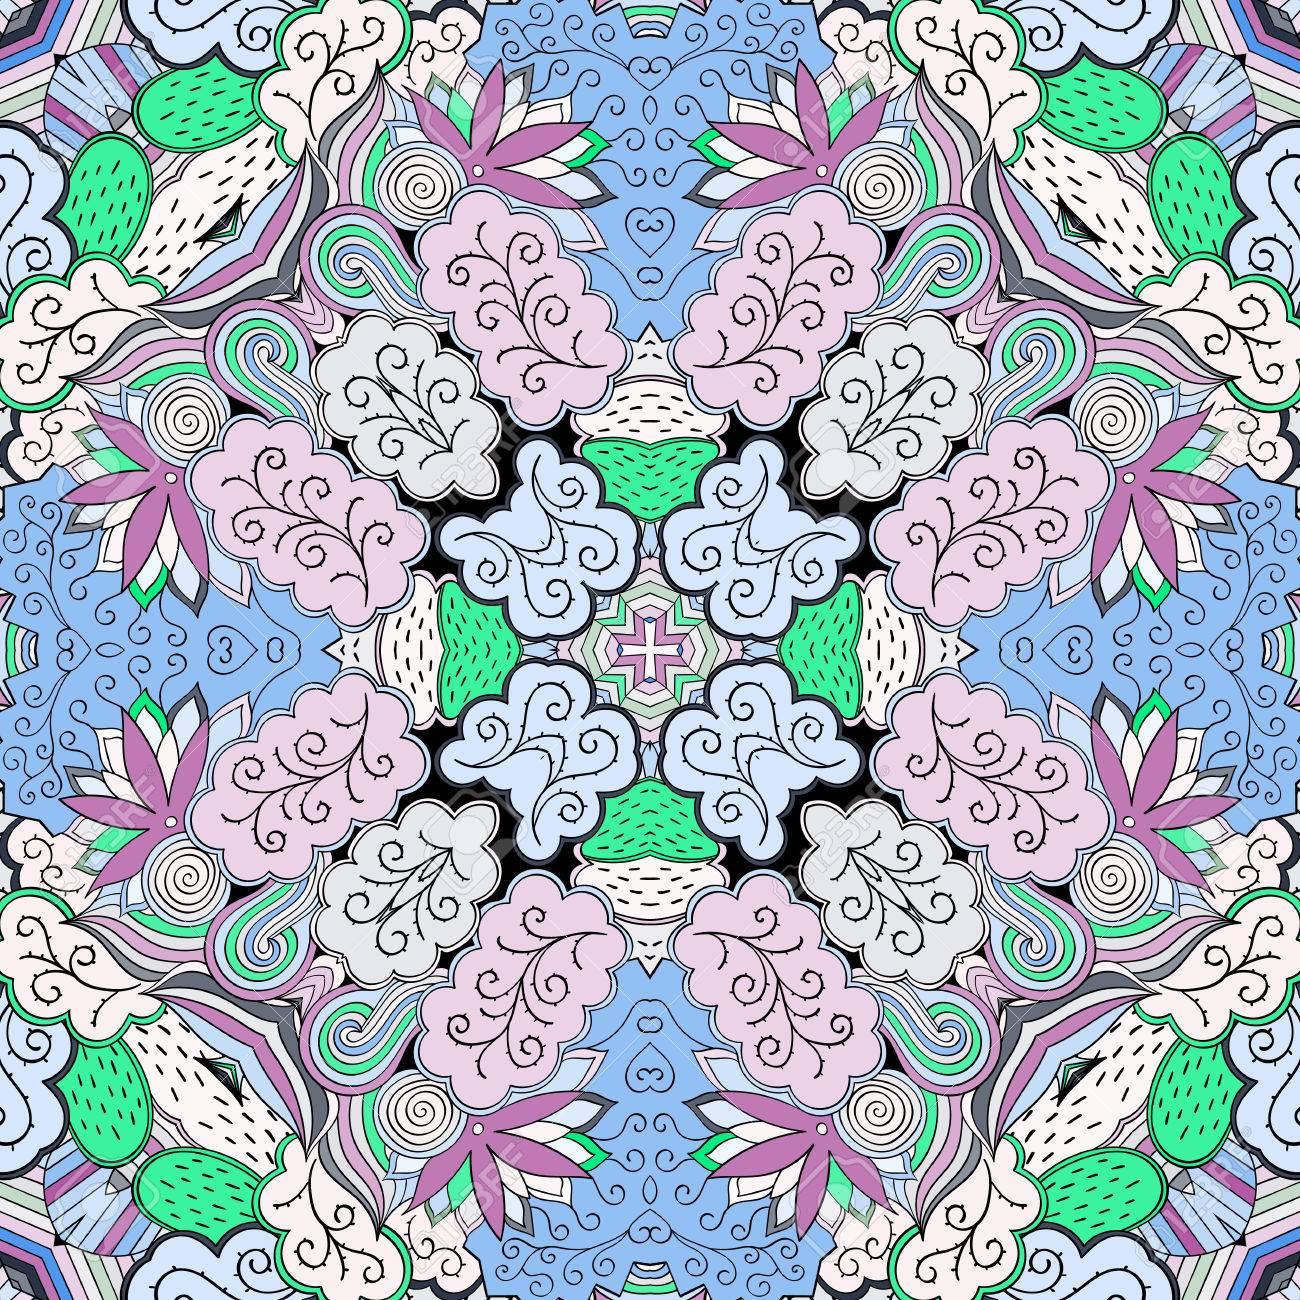 Teppich design textur  Tracery Buntes Muster. Mehendi-Teppich-Design. Neat Sogar ...